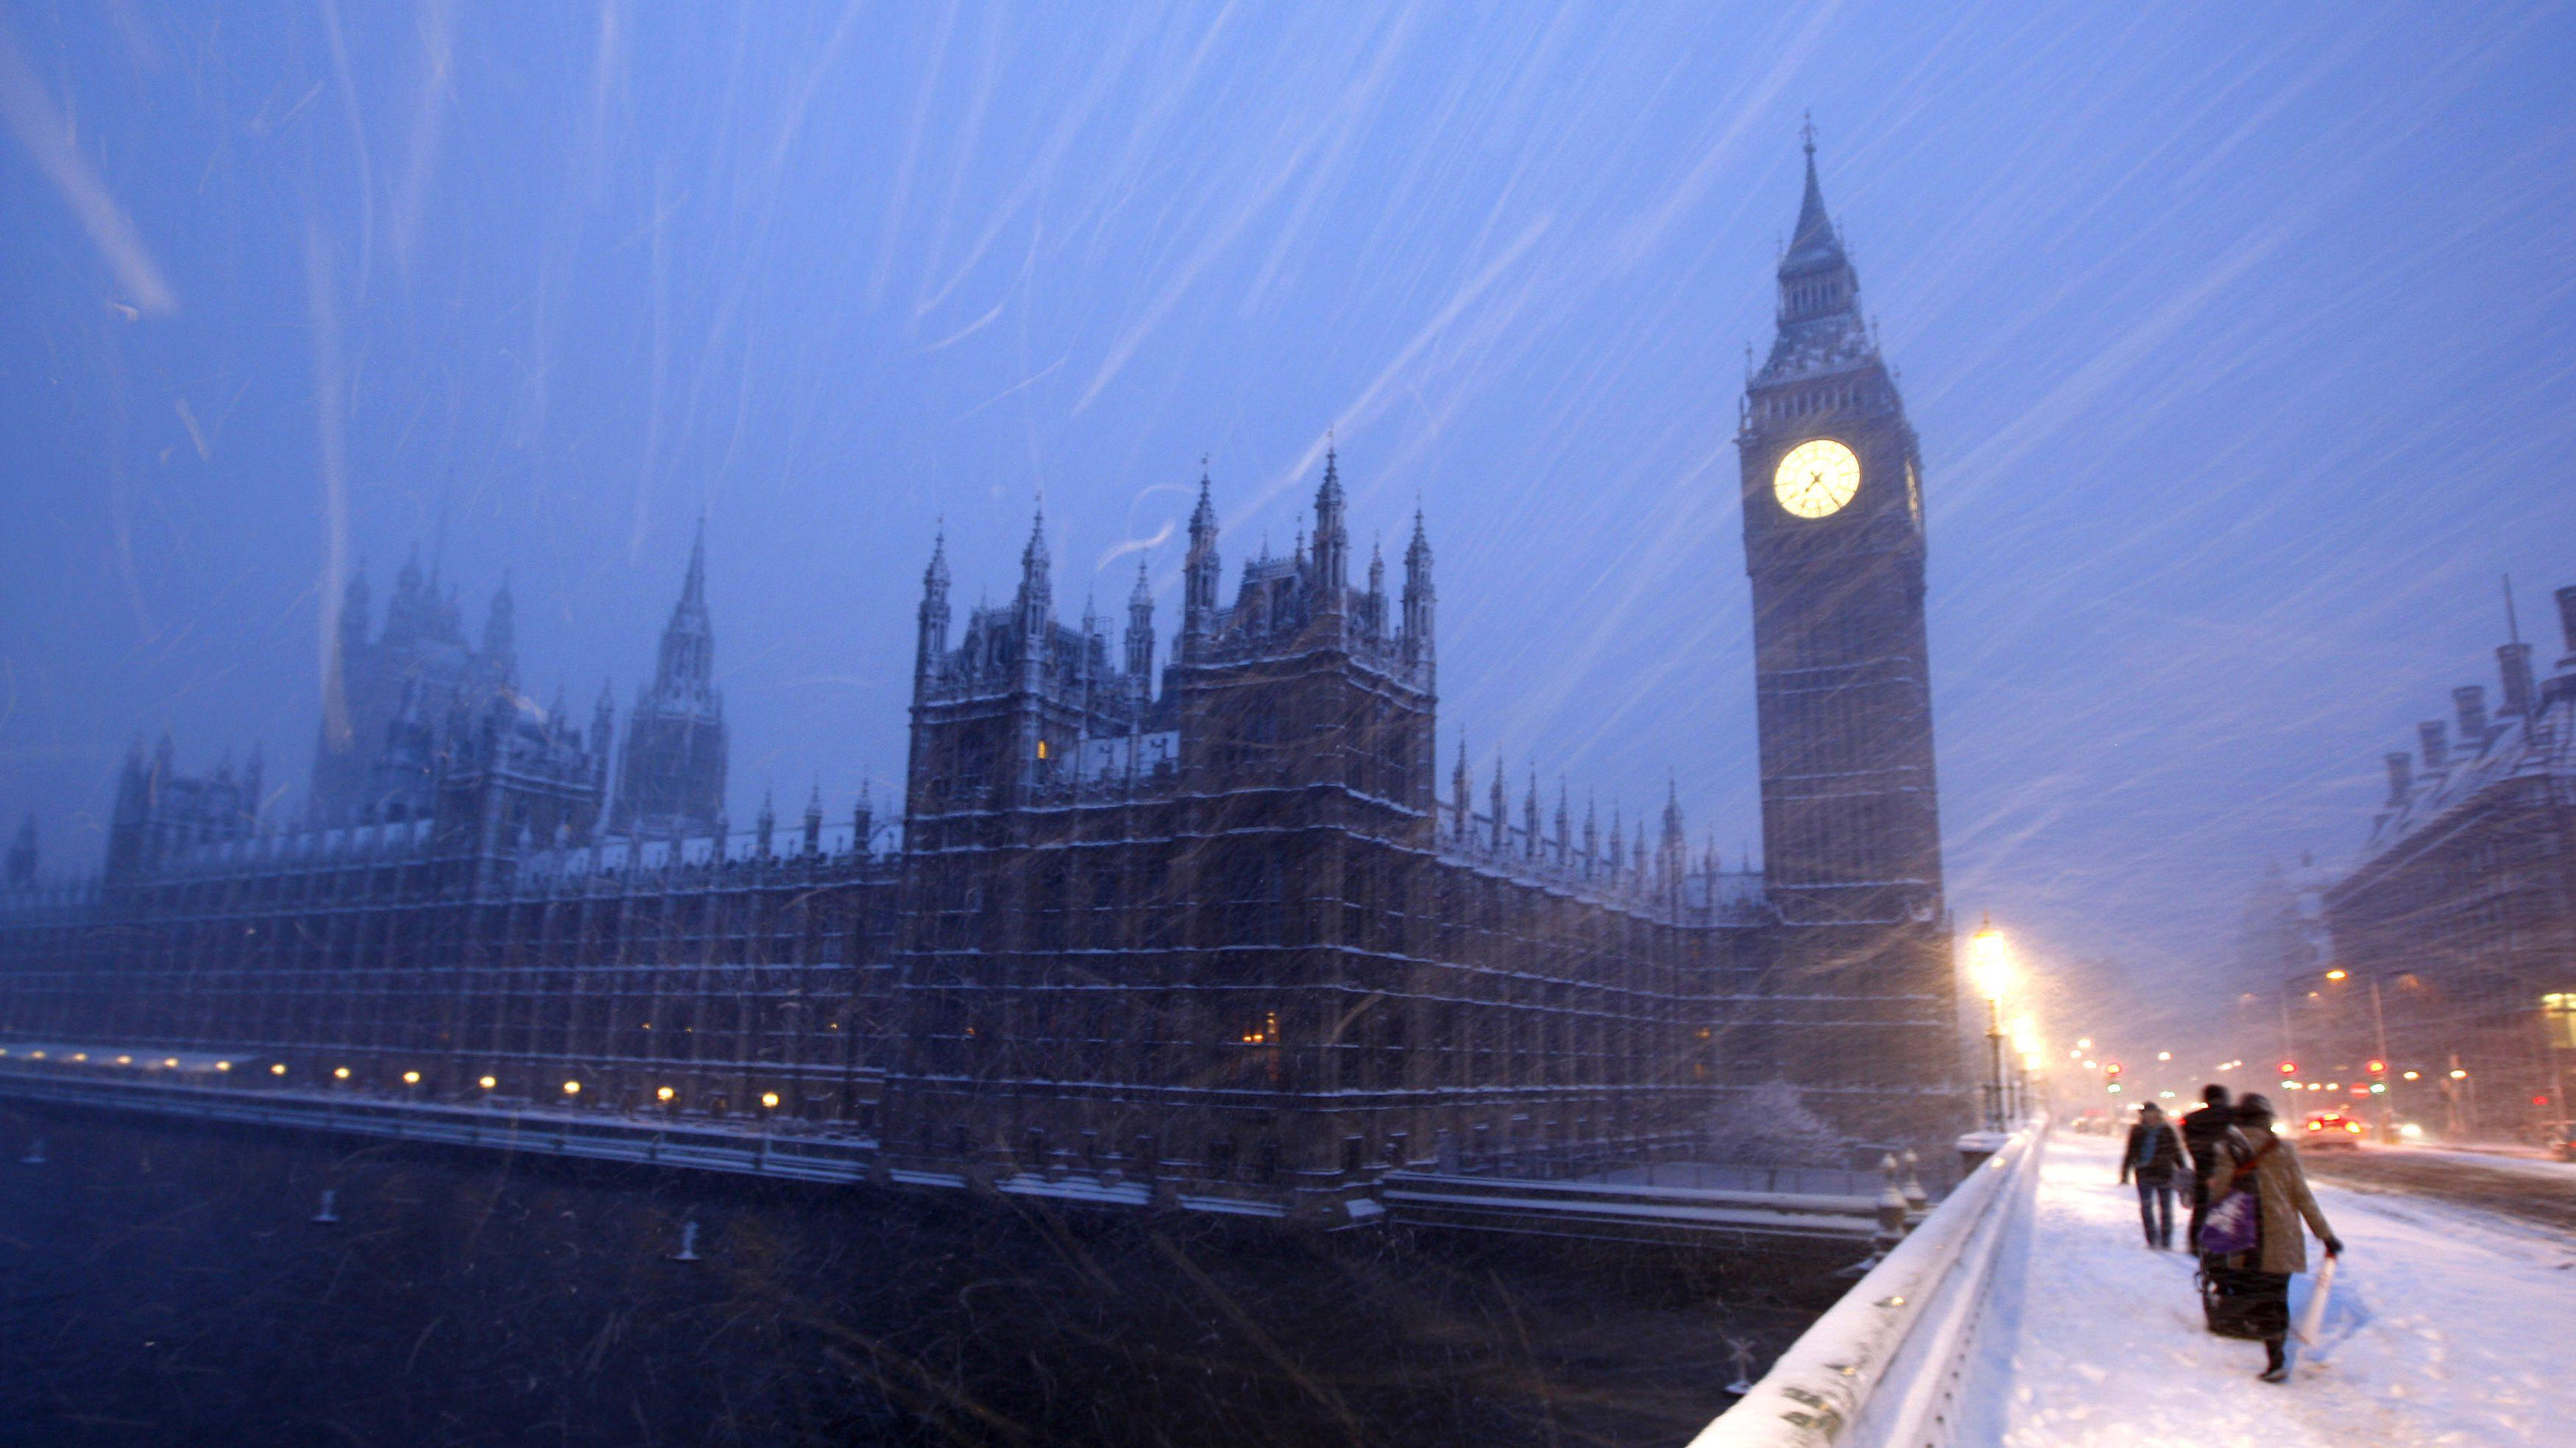 Pedestrians walk across Westminster Bridge as snow falls in central London